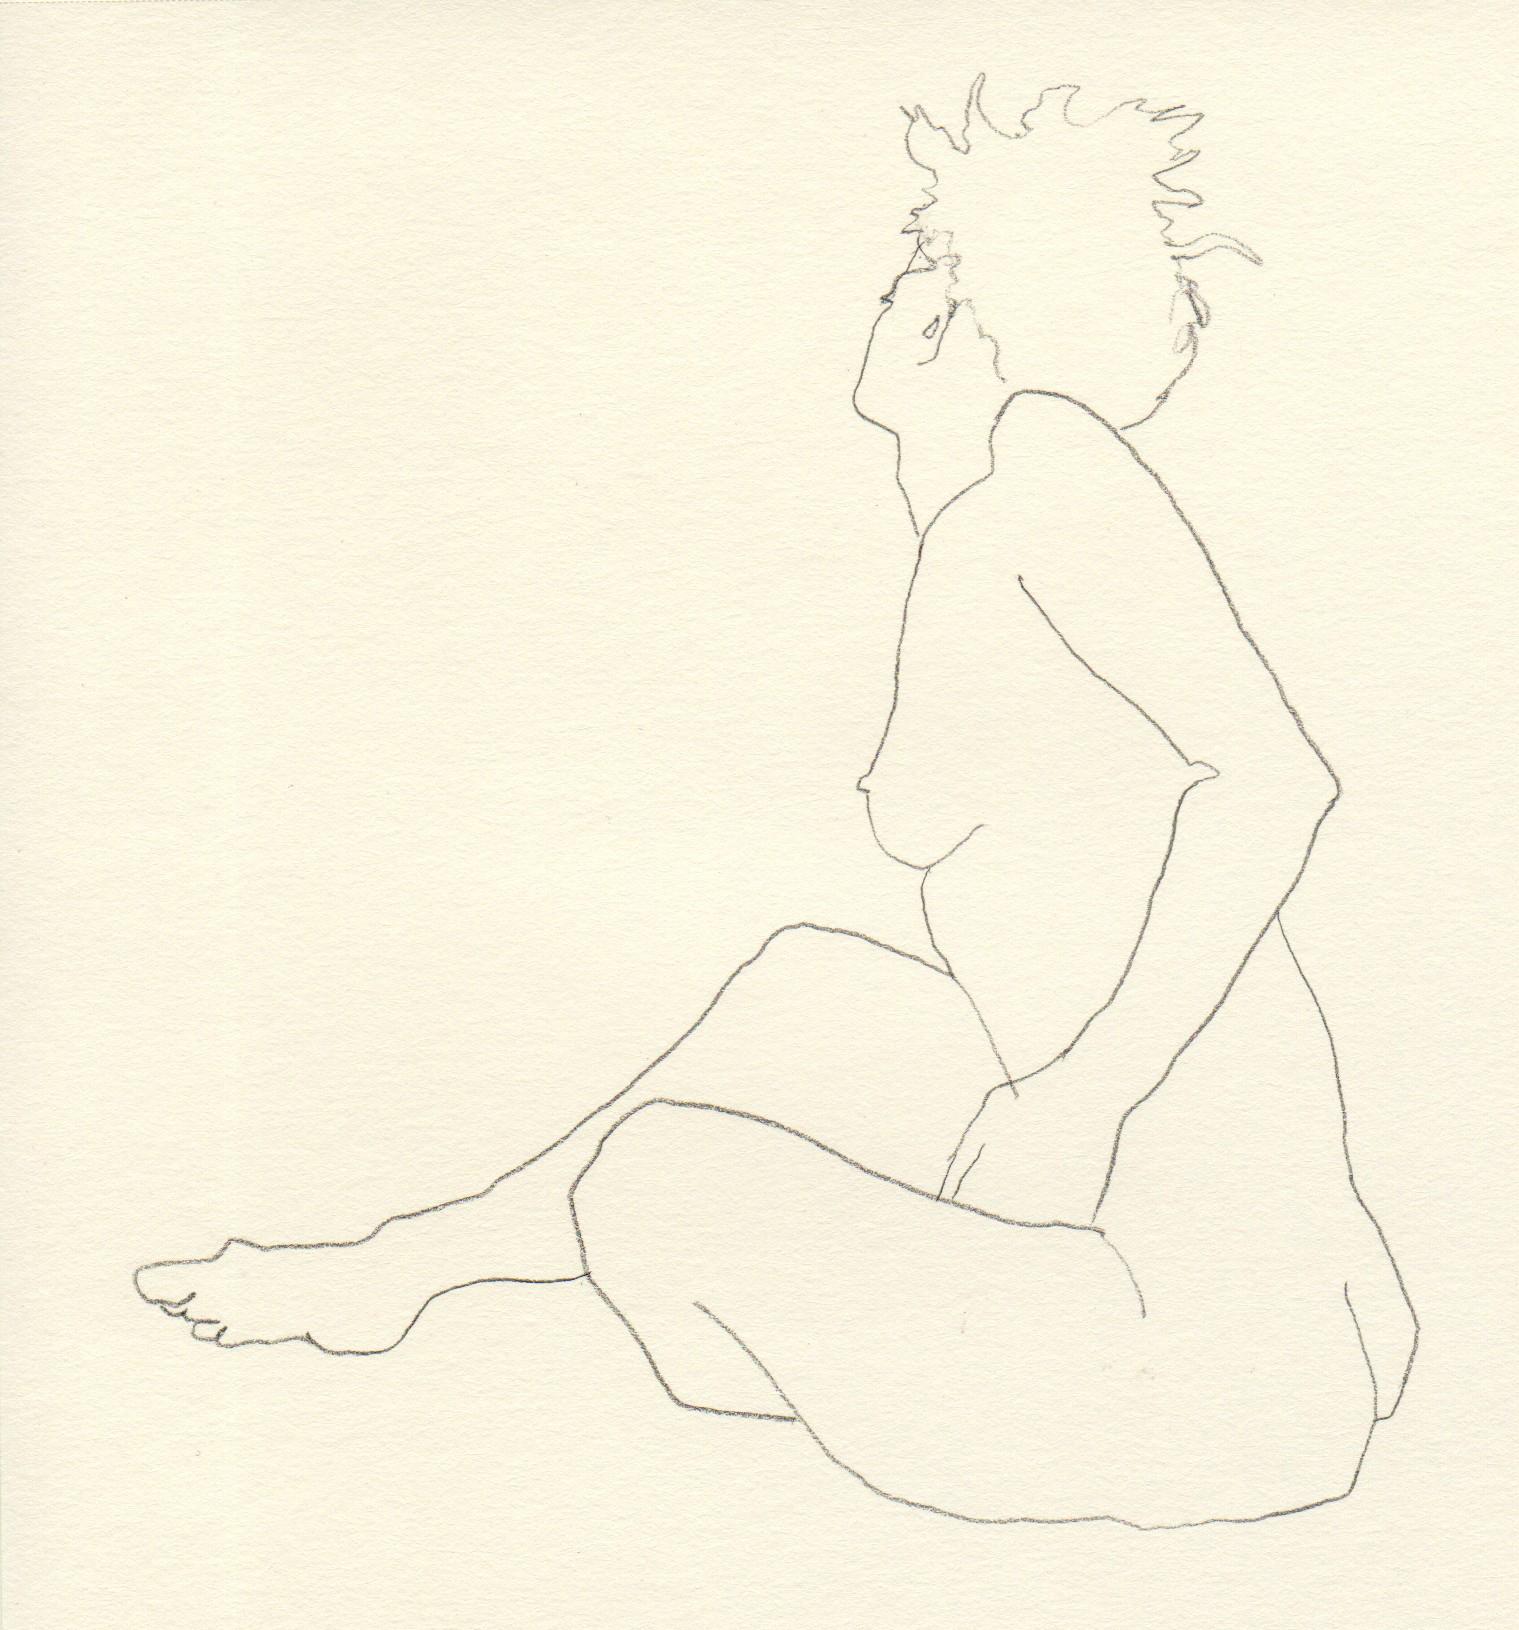 2014_Sketch_F-Beudin_08